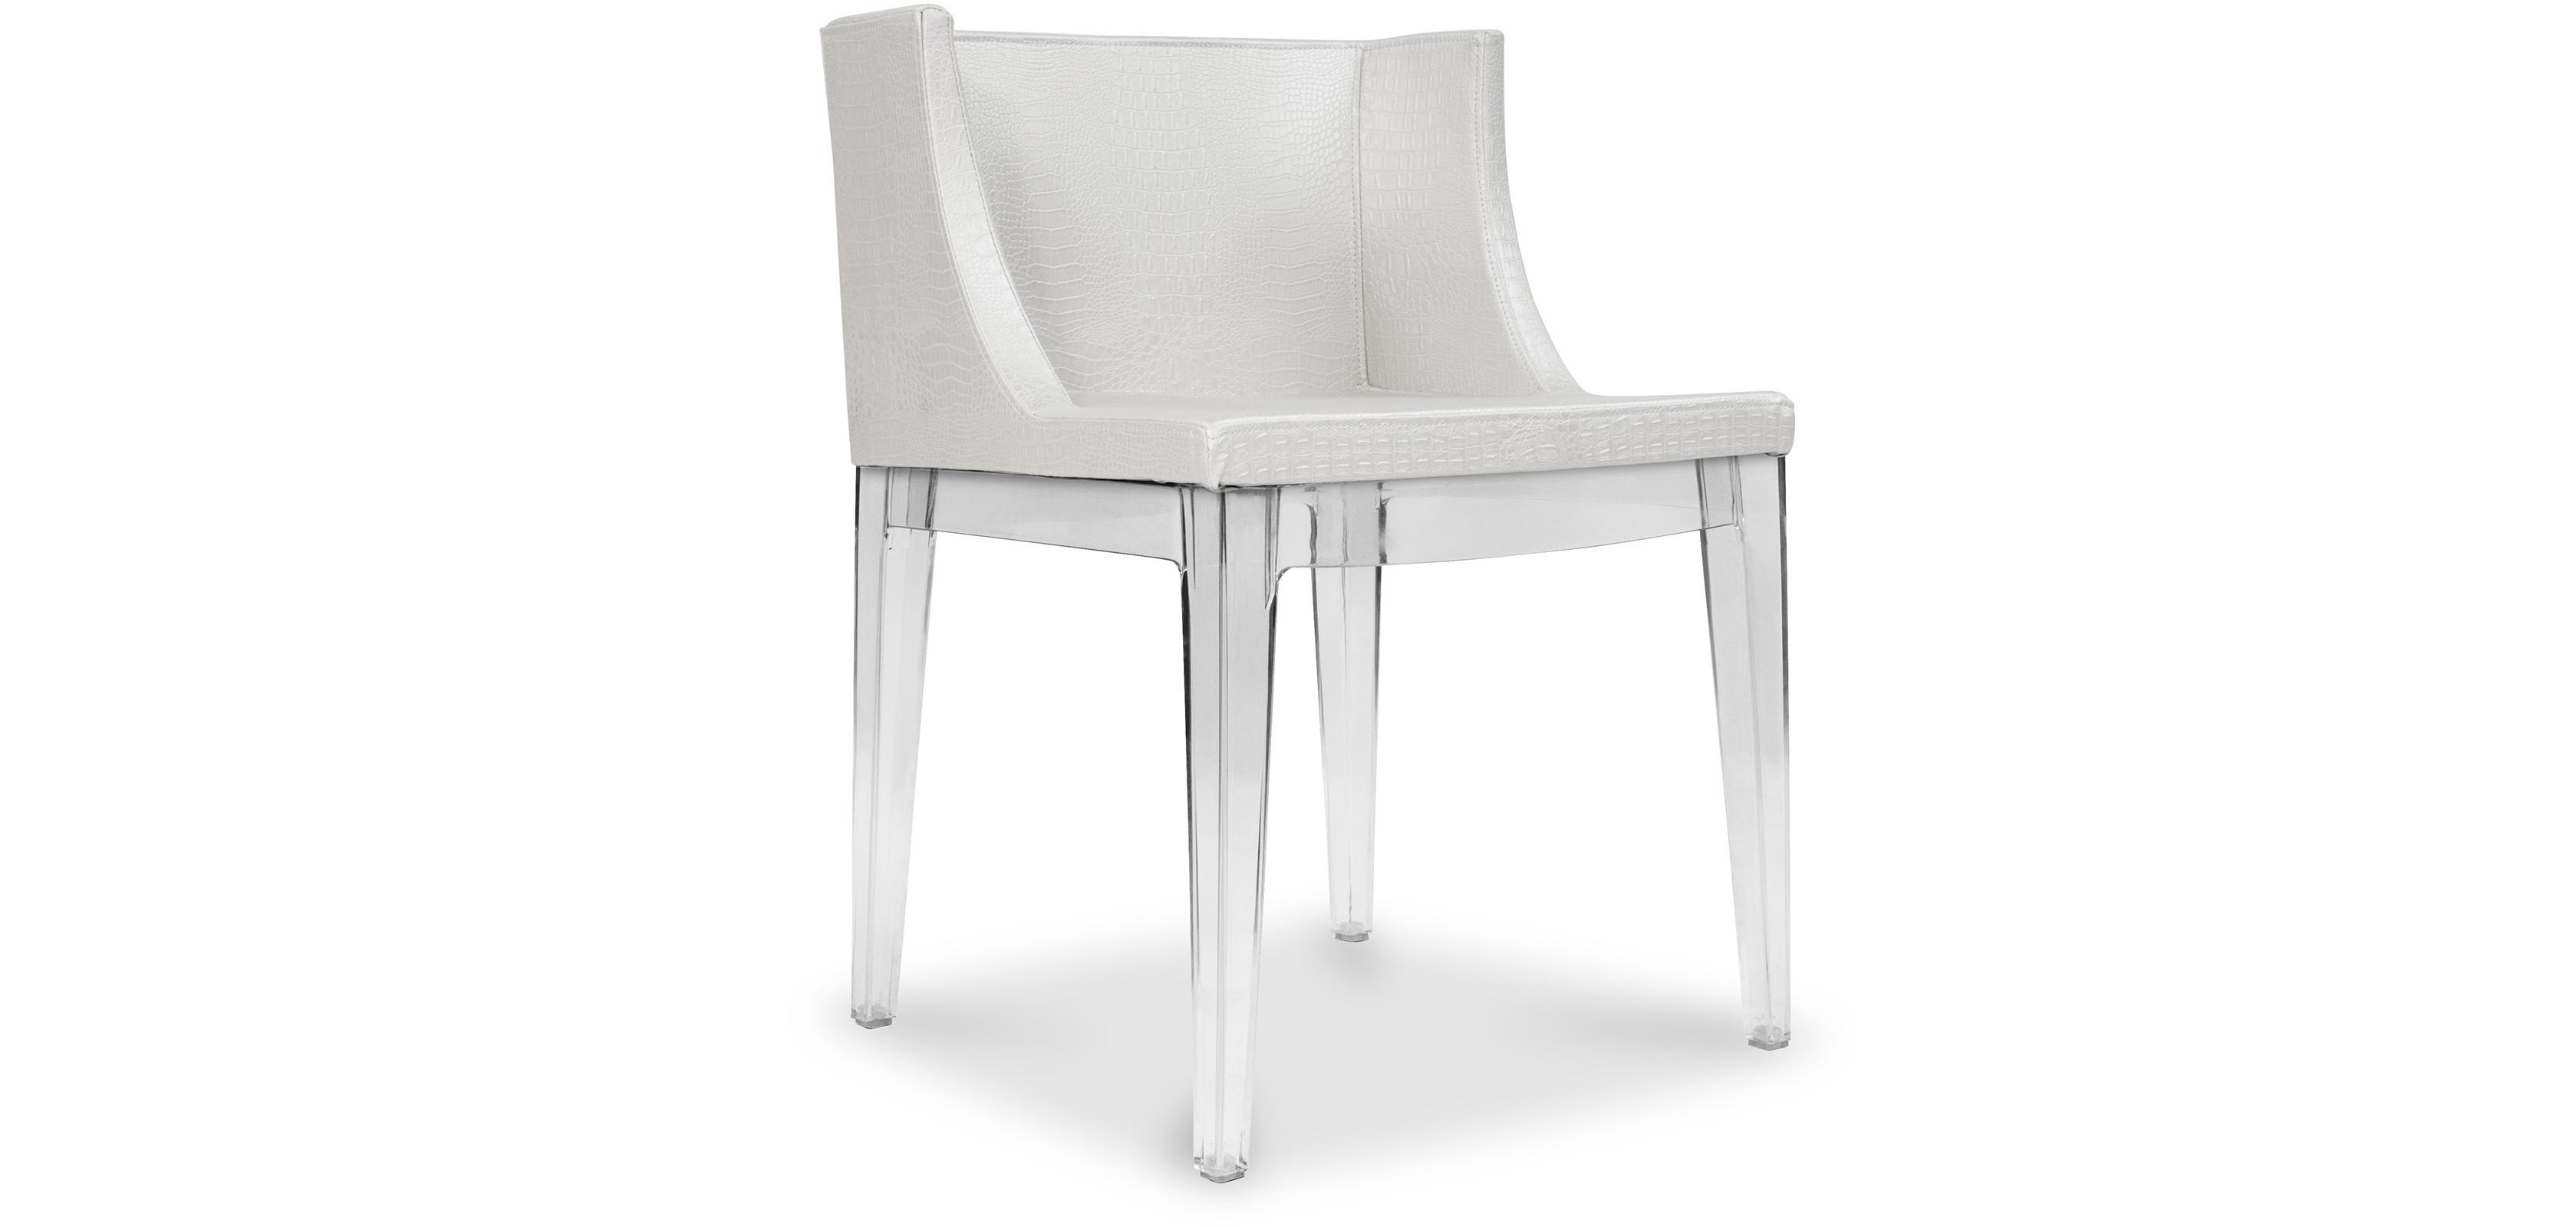 White Mademoiselle Chair Philippe Starck